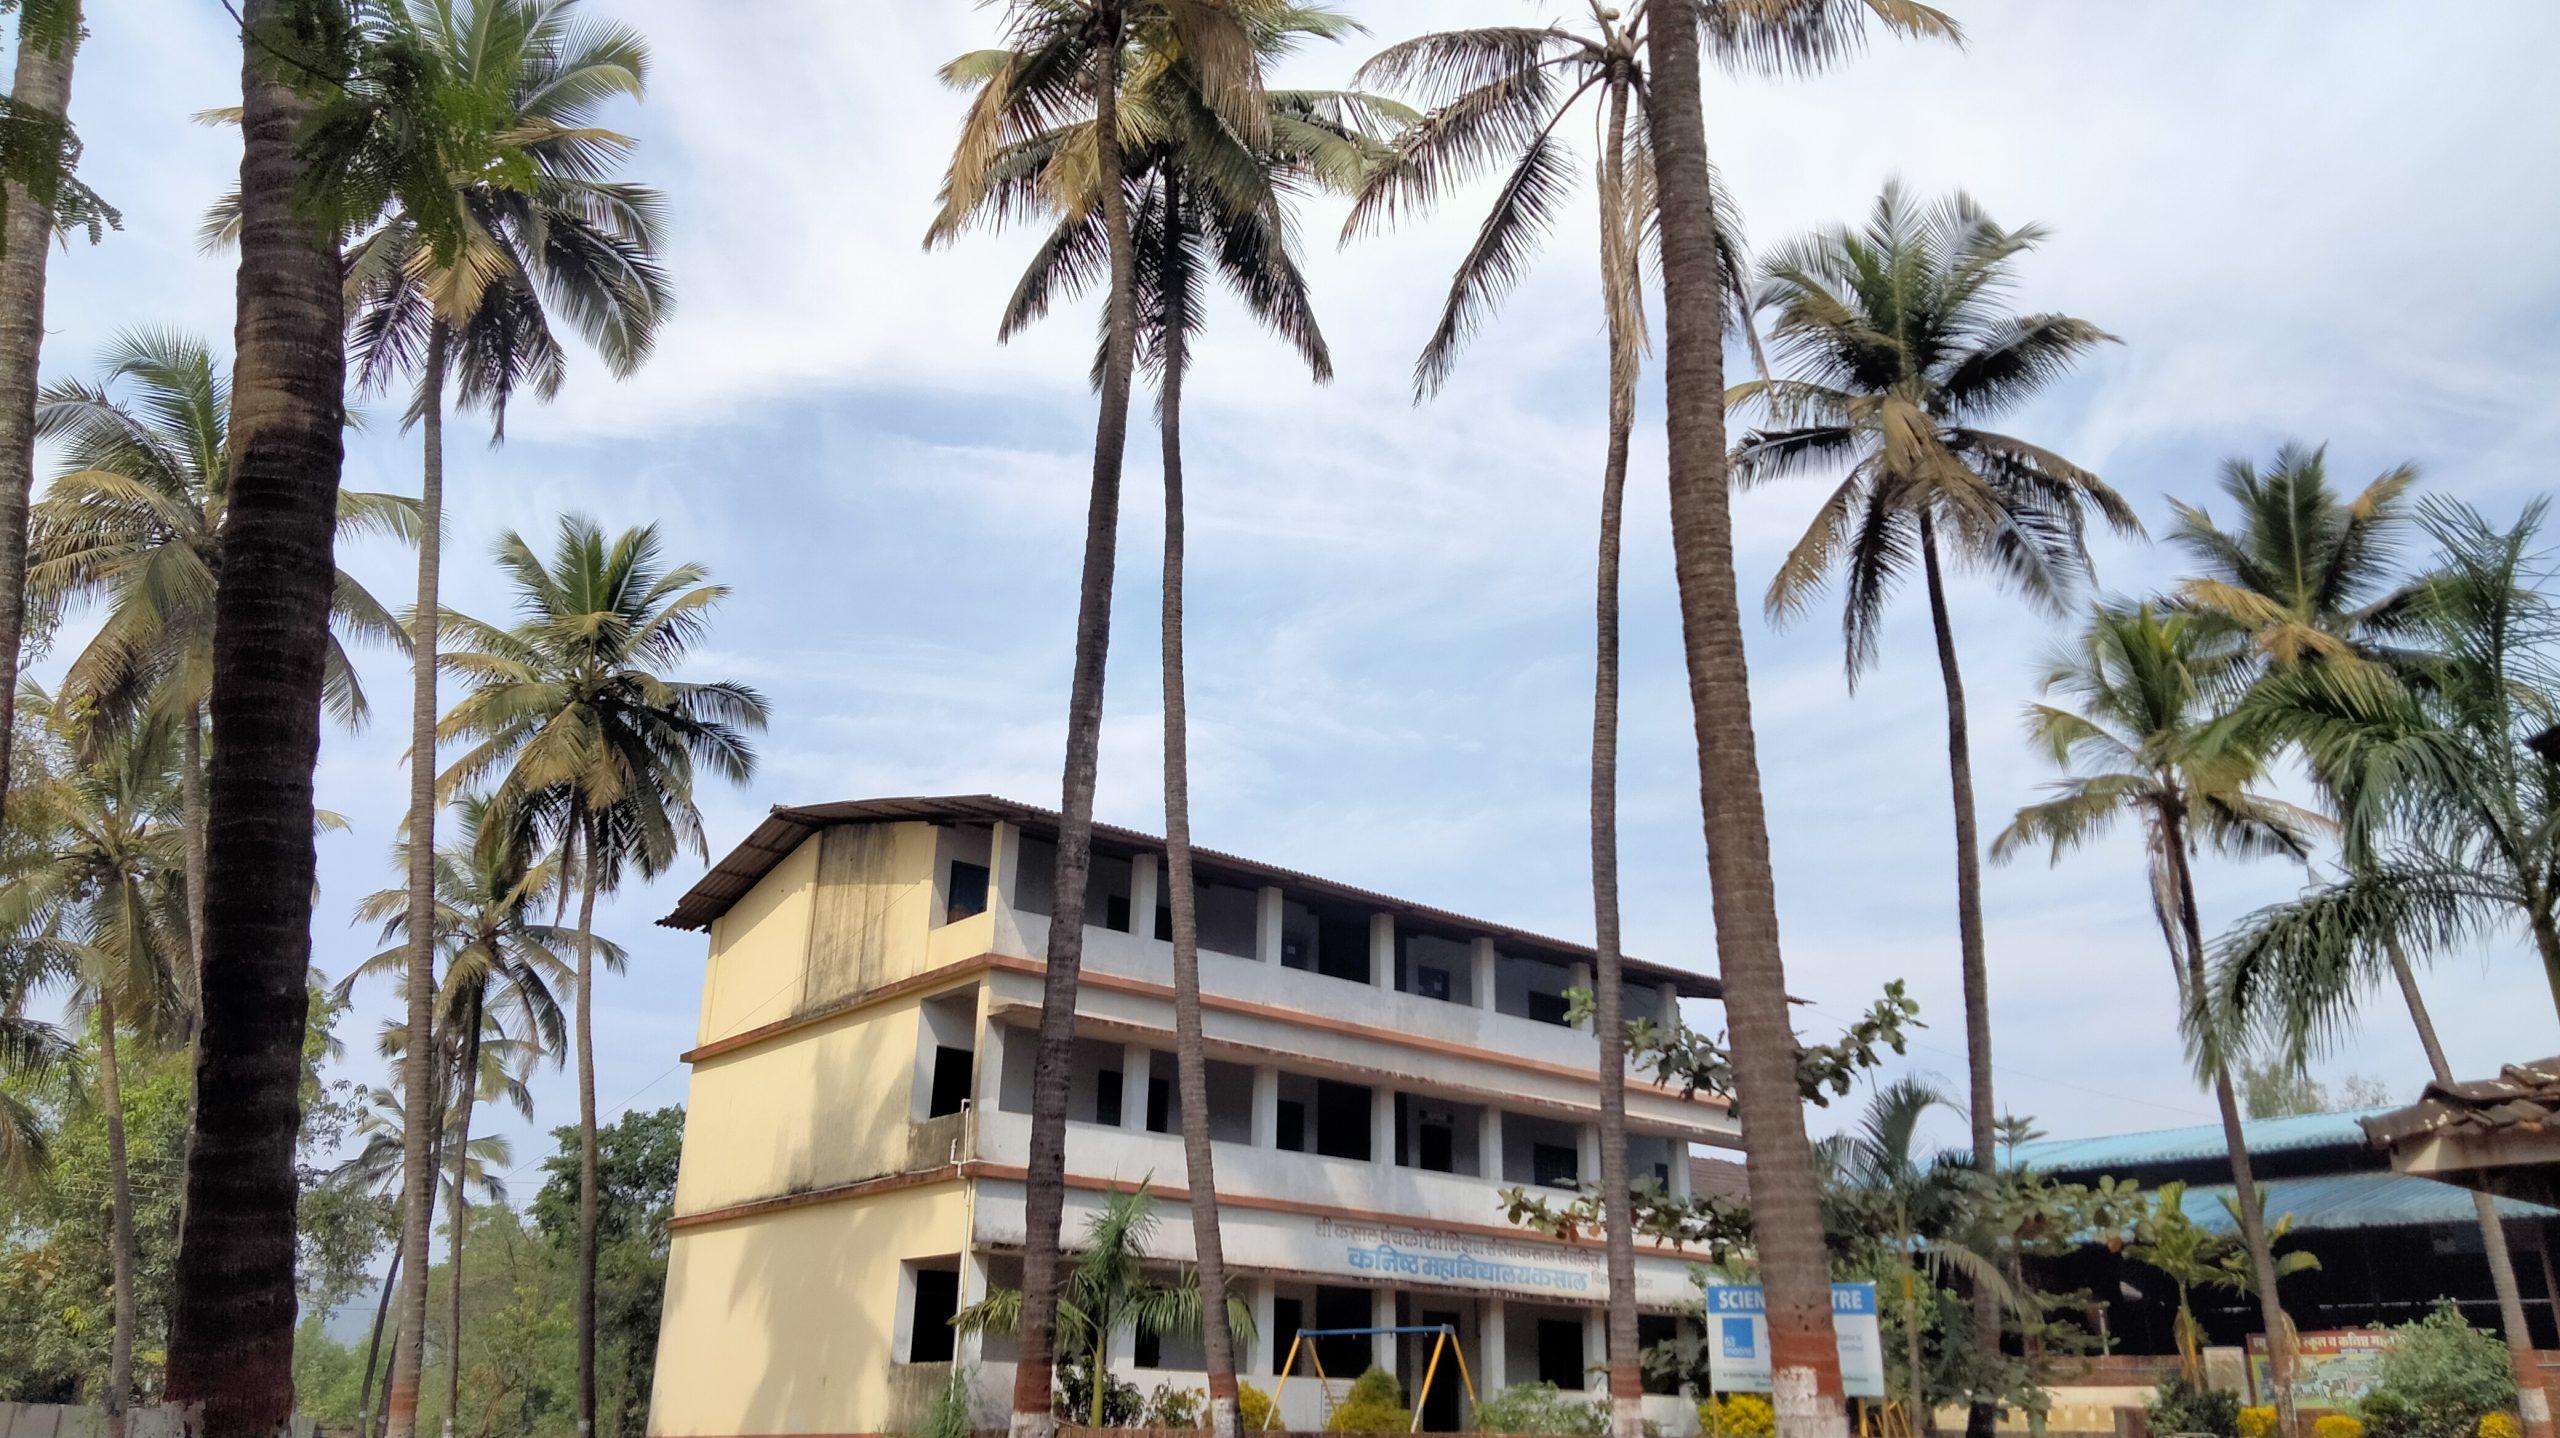 School view through coconut trees